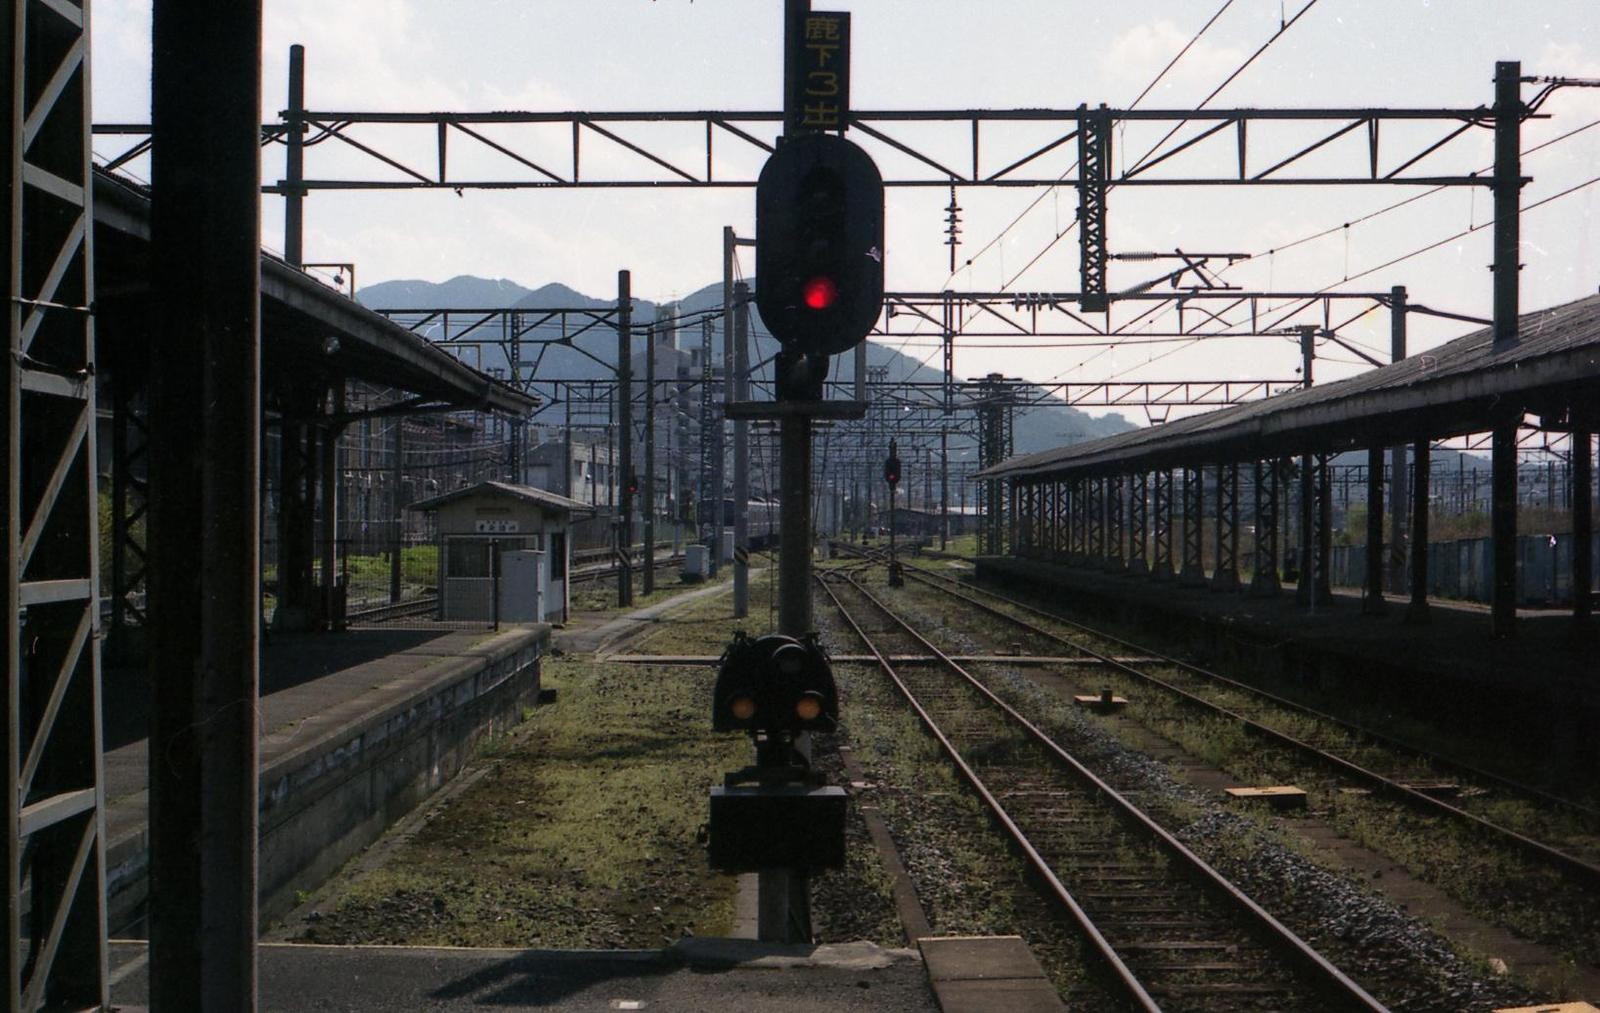 20010401c40